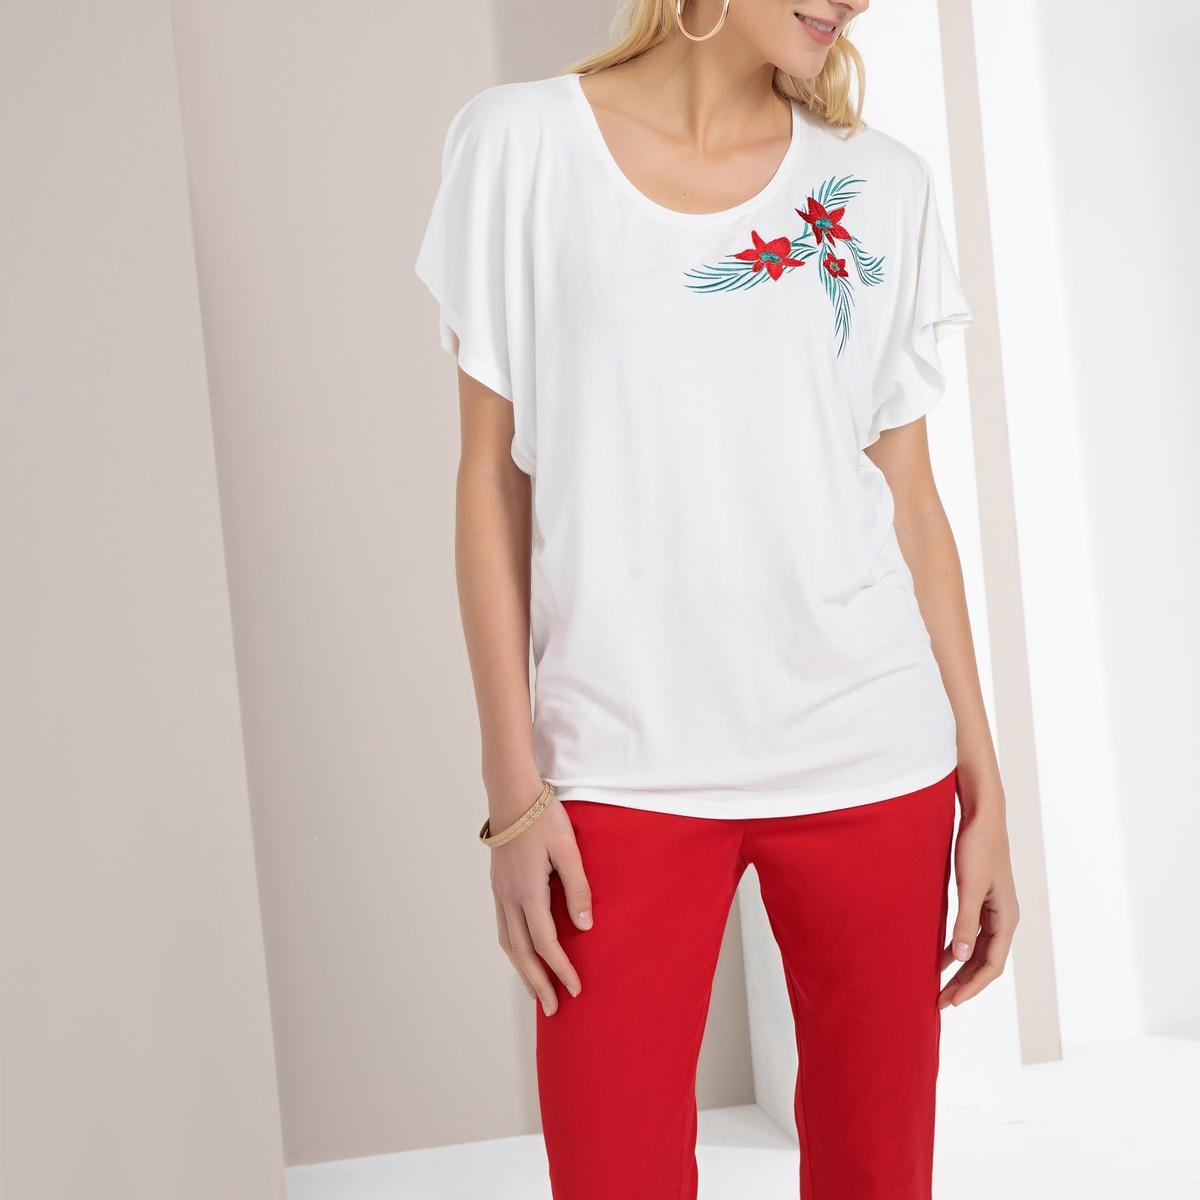 T-shirt de gola redonda, bordado aplicado